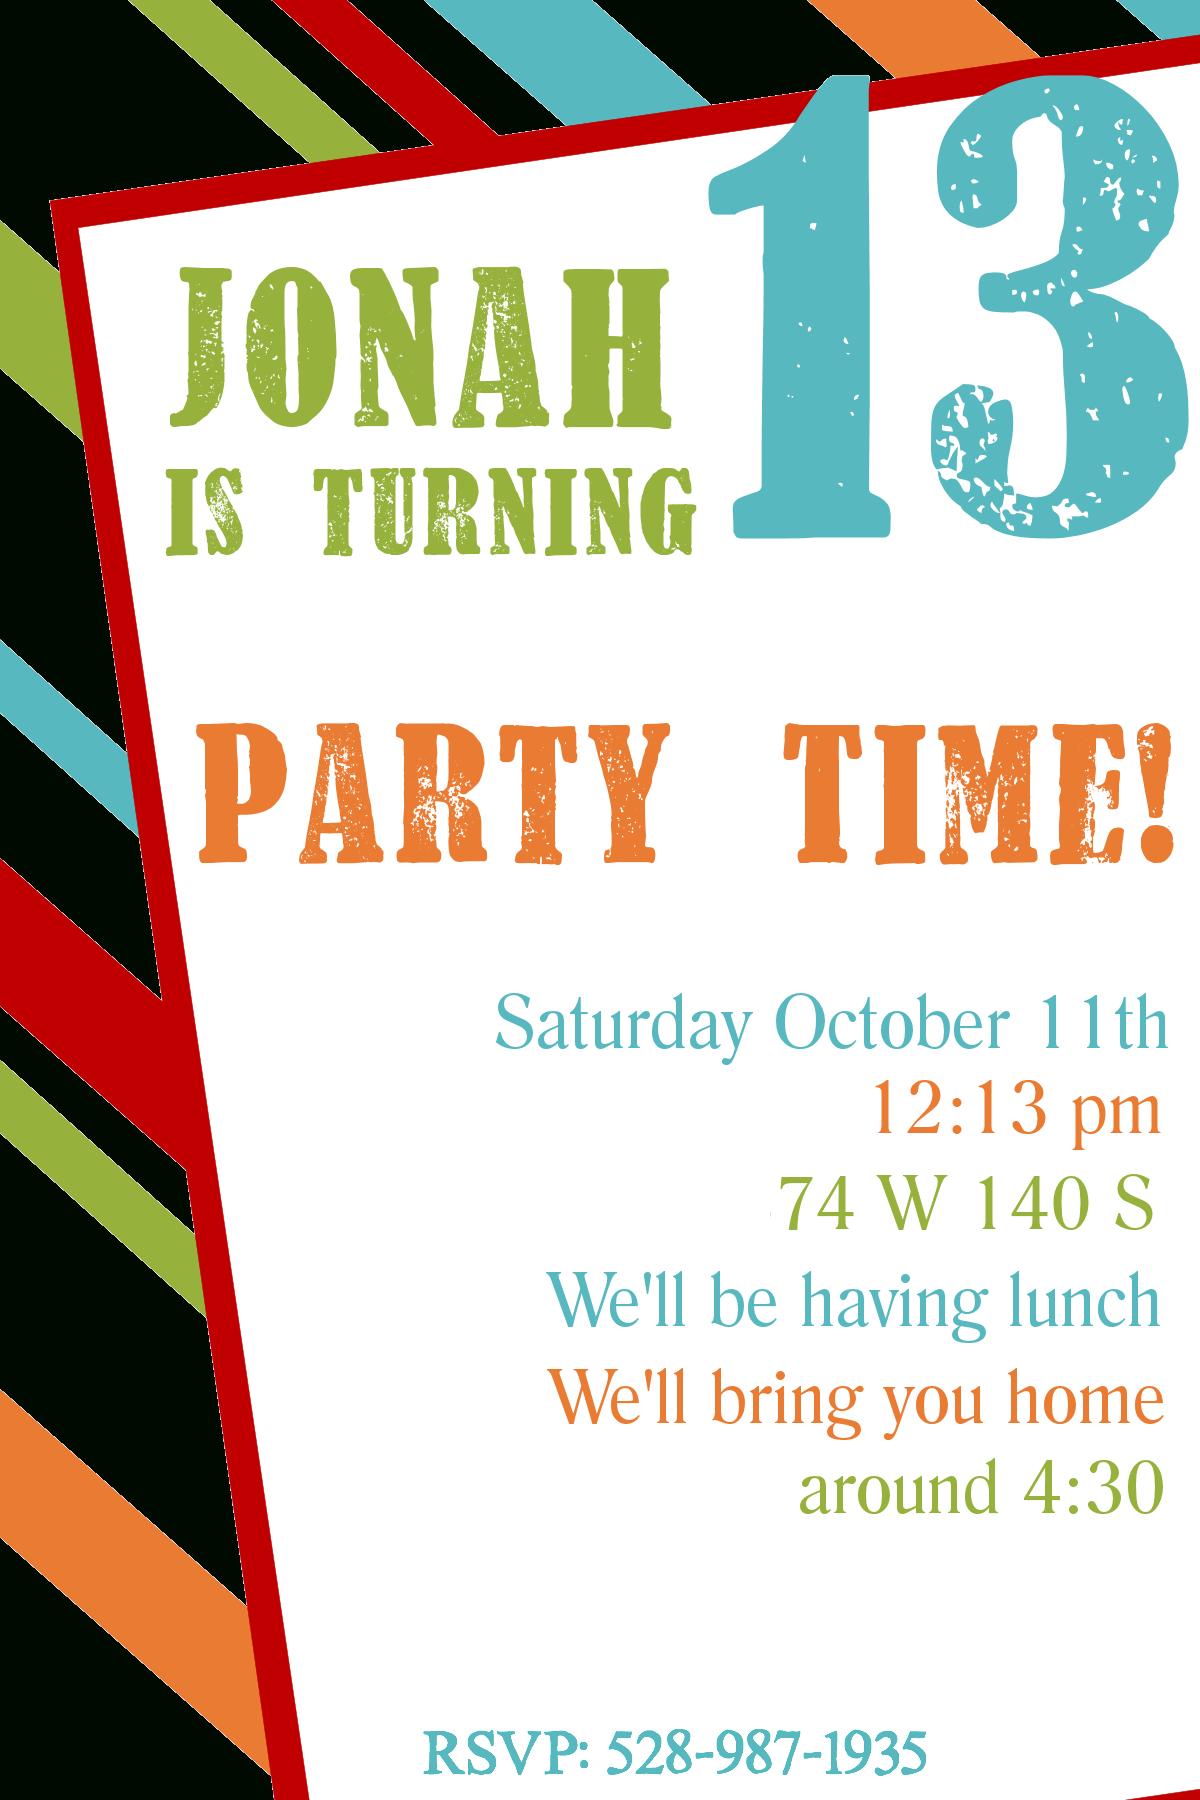 Free Printable Birthday Invitation Templates - Free Printable Party Invitations